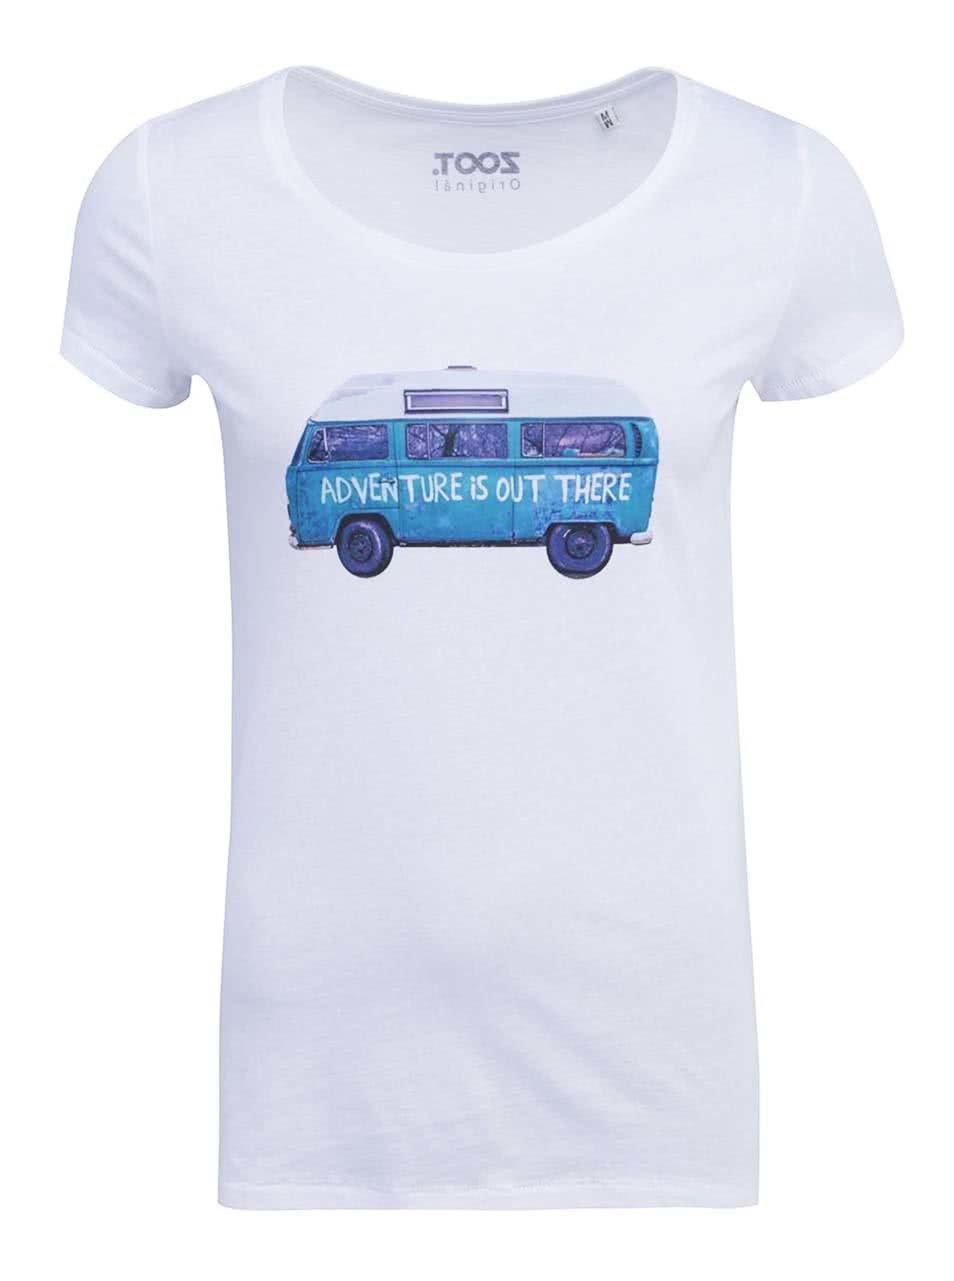 Bílé dámské tričko ZOOT Originál Adventure is Out There